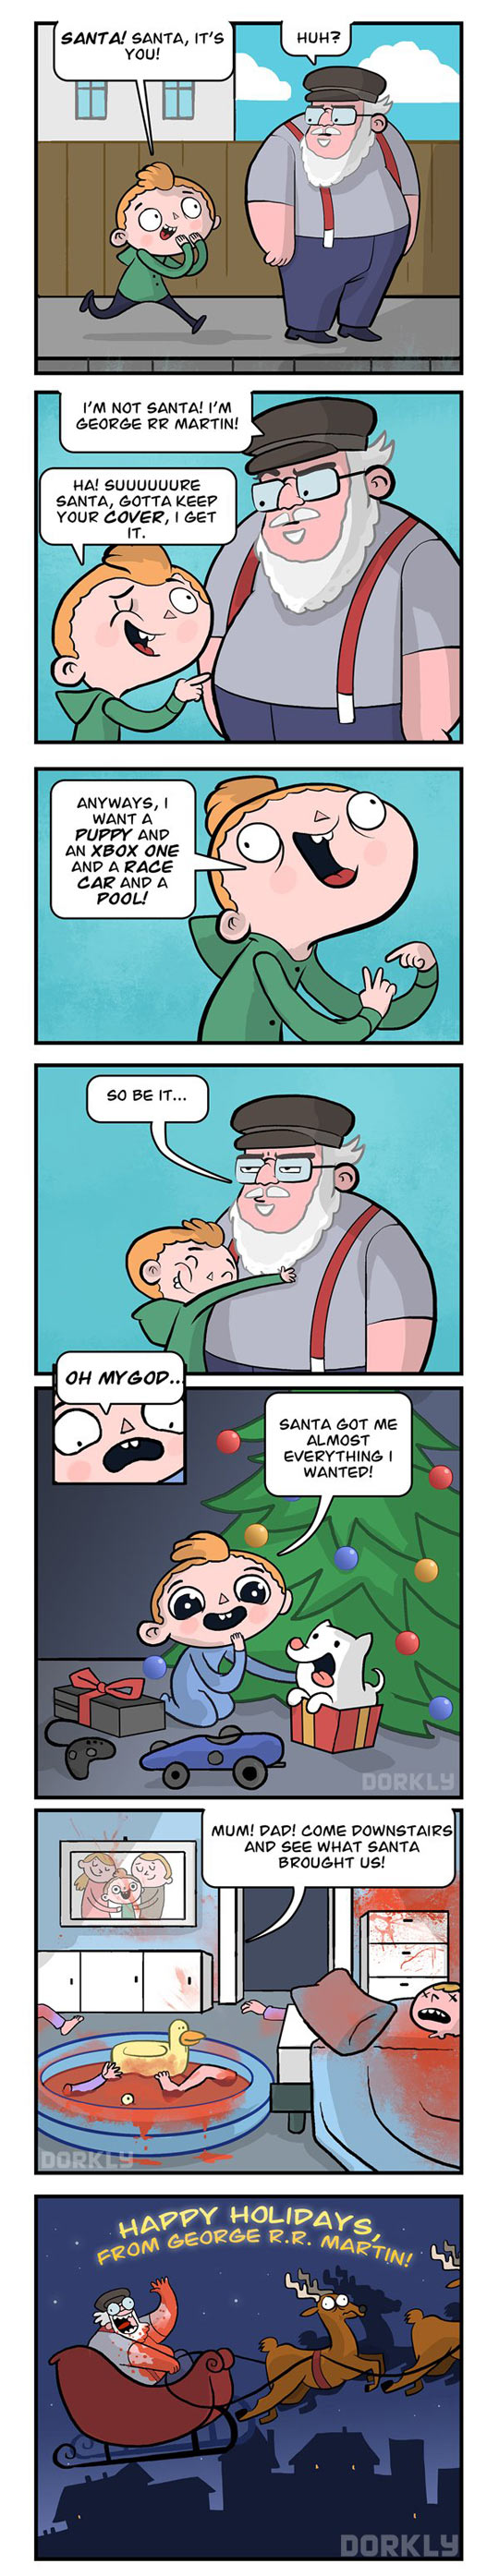 funny-Christmas-George-Martin-cartoon